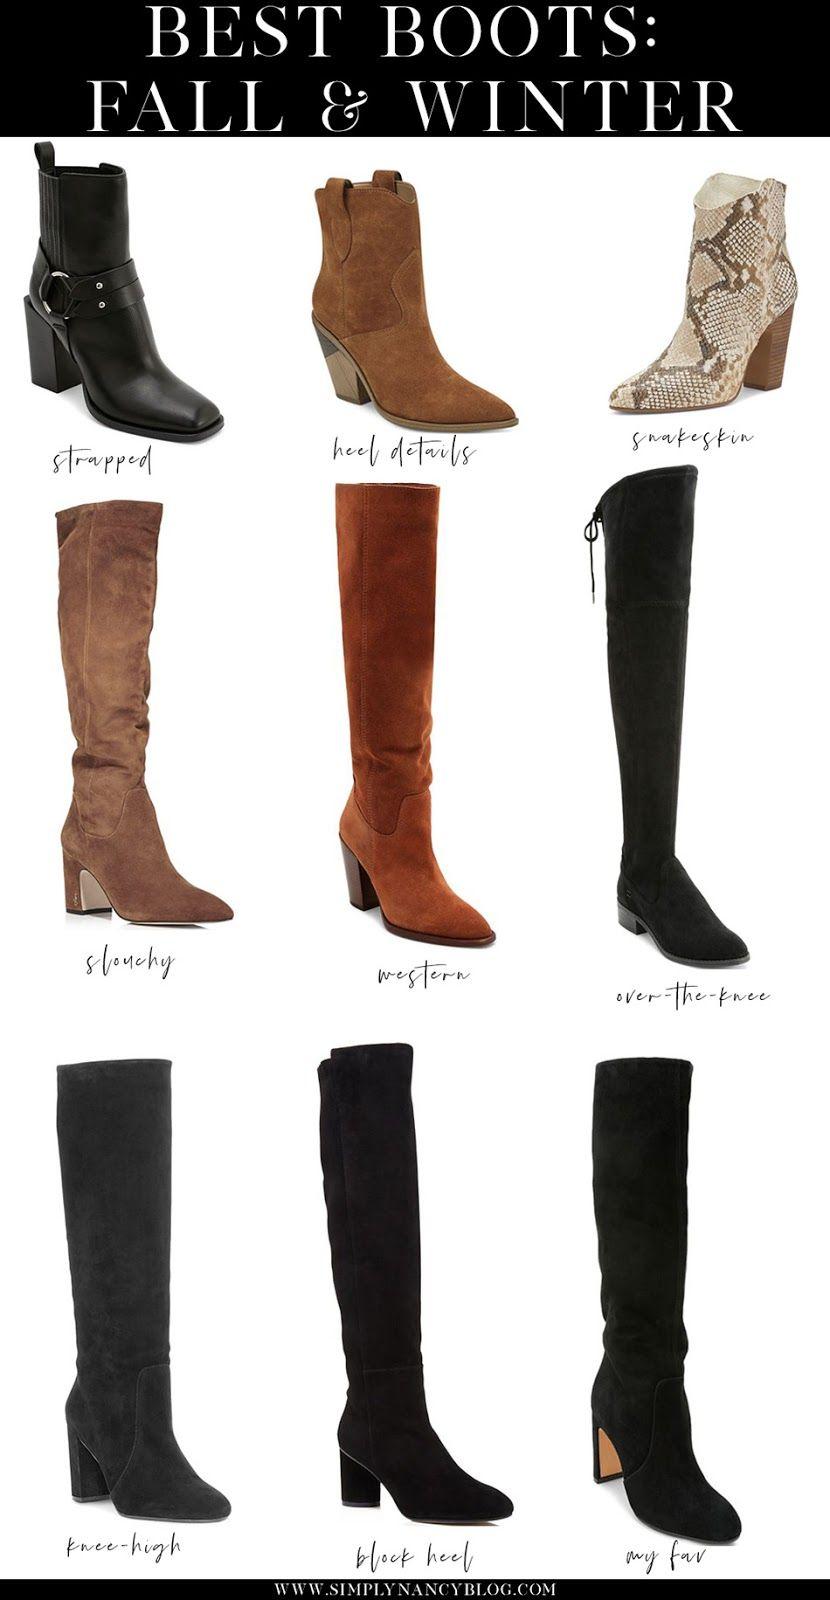 Best Winter Boots 2018 Under 200 On Sale Boots Best Winter Boots Trending Winter Boots